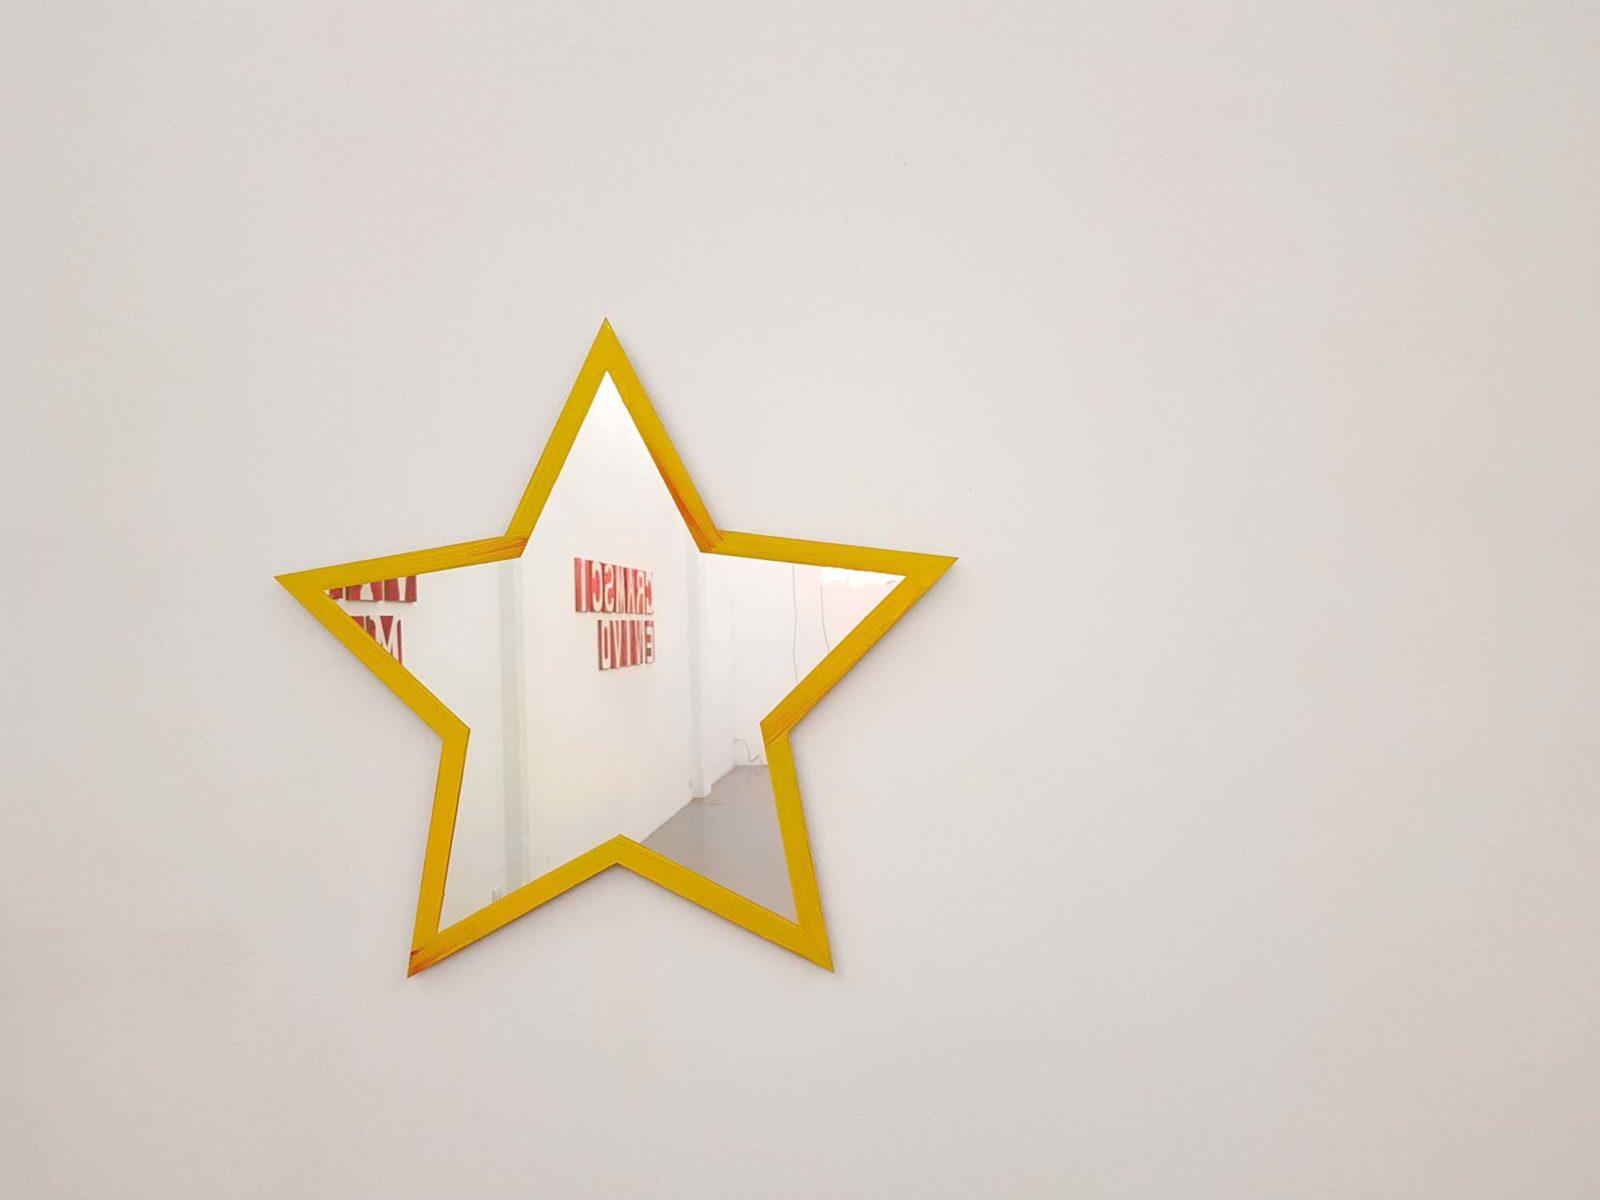 Nemanja Cvijanović, Dico sempre ciò che penso, 2019, installation view, Turin